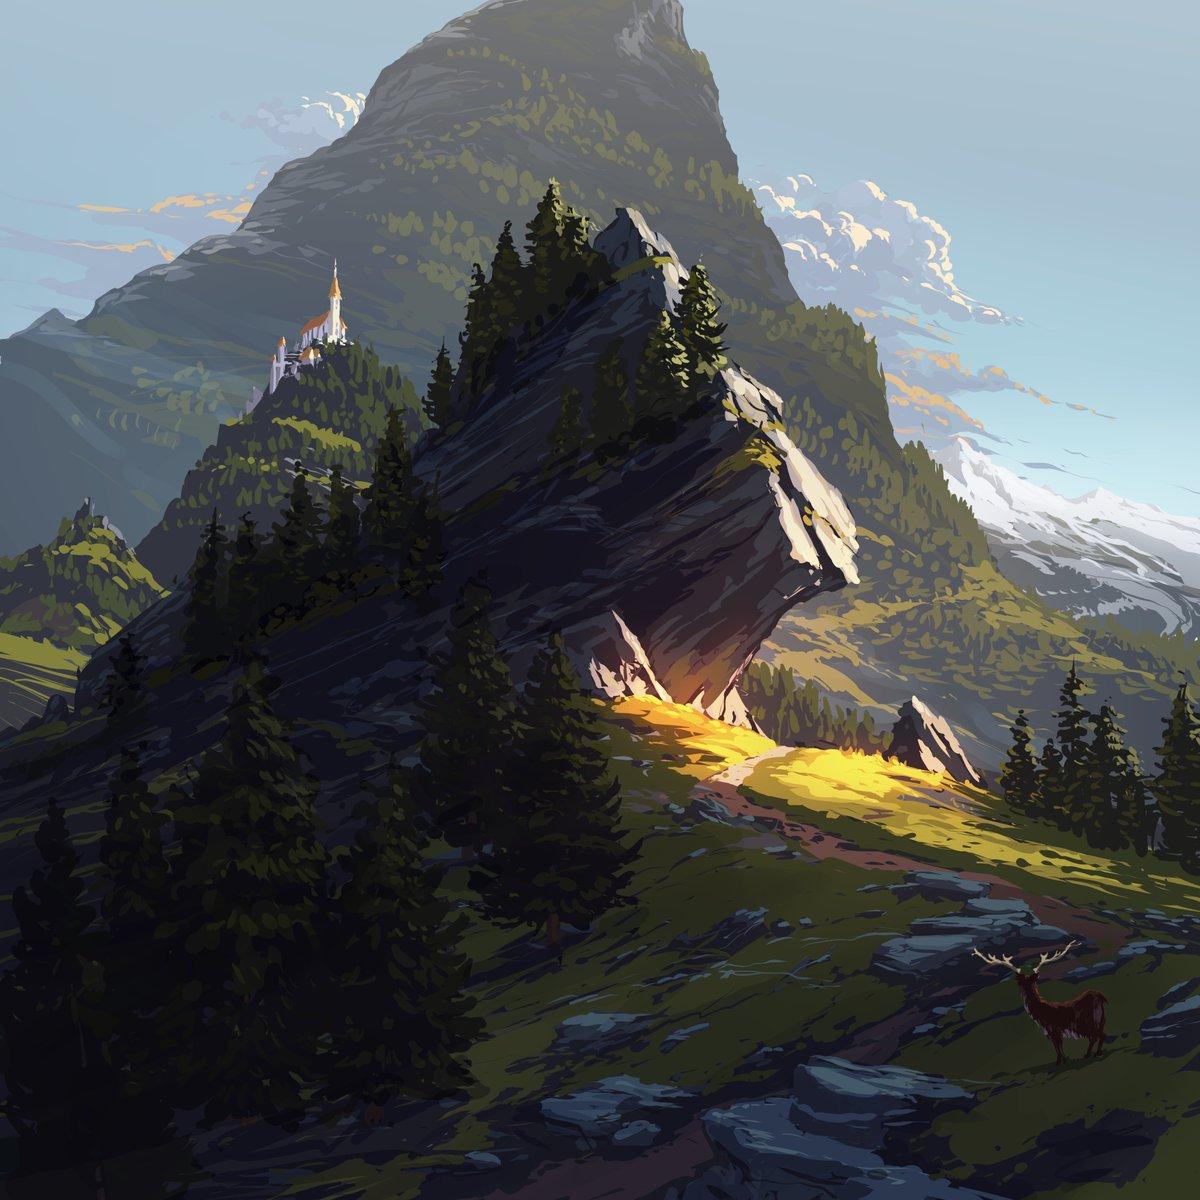 Some painting I did. #digitalart #digitalpainting #fantasy #environment #mountains #nature #rocks #sunset pic.twitter.com/gmhSVwZnQN